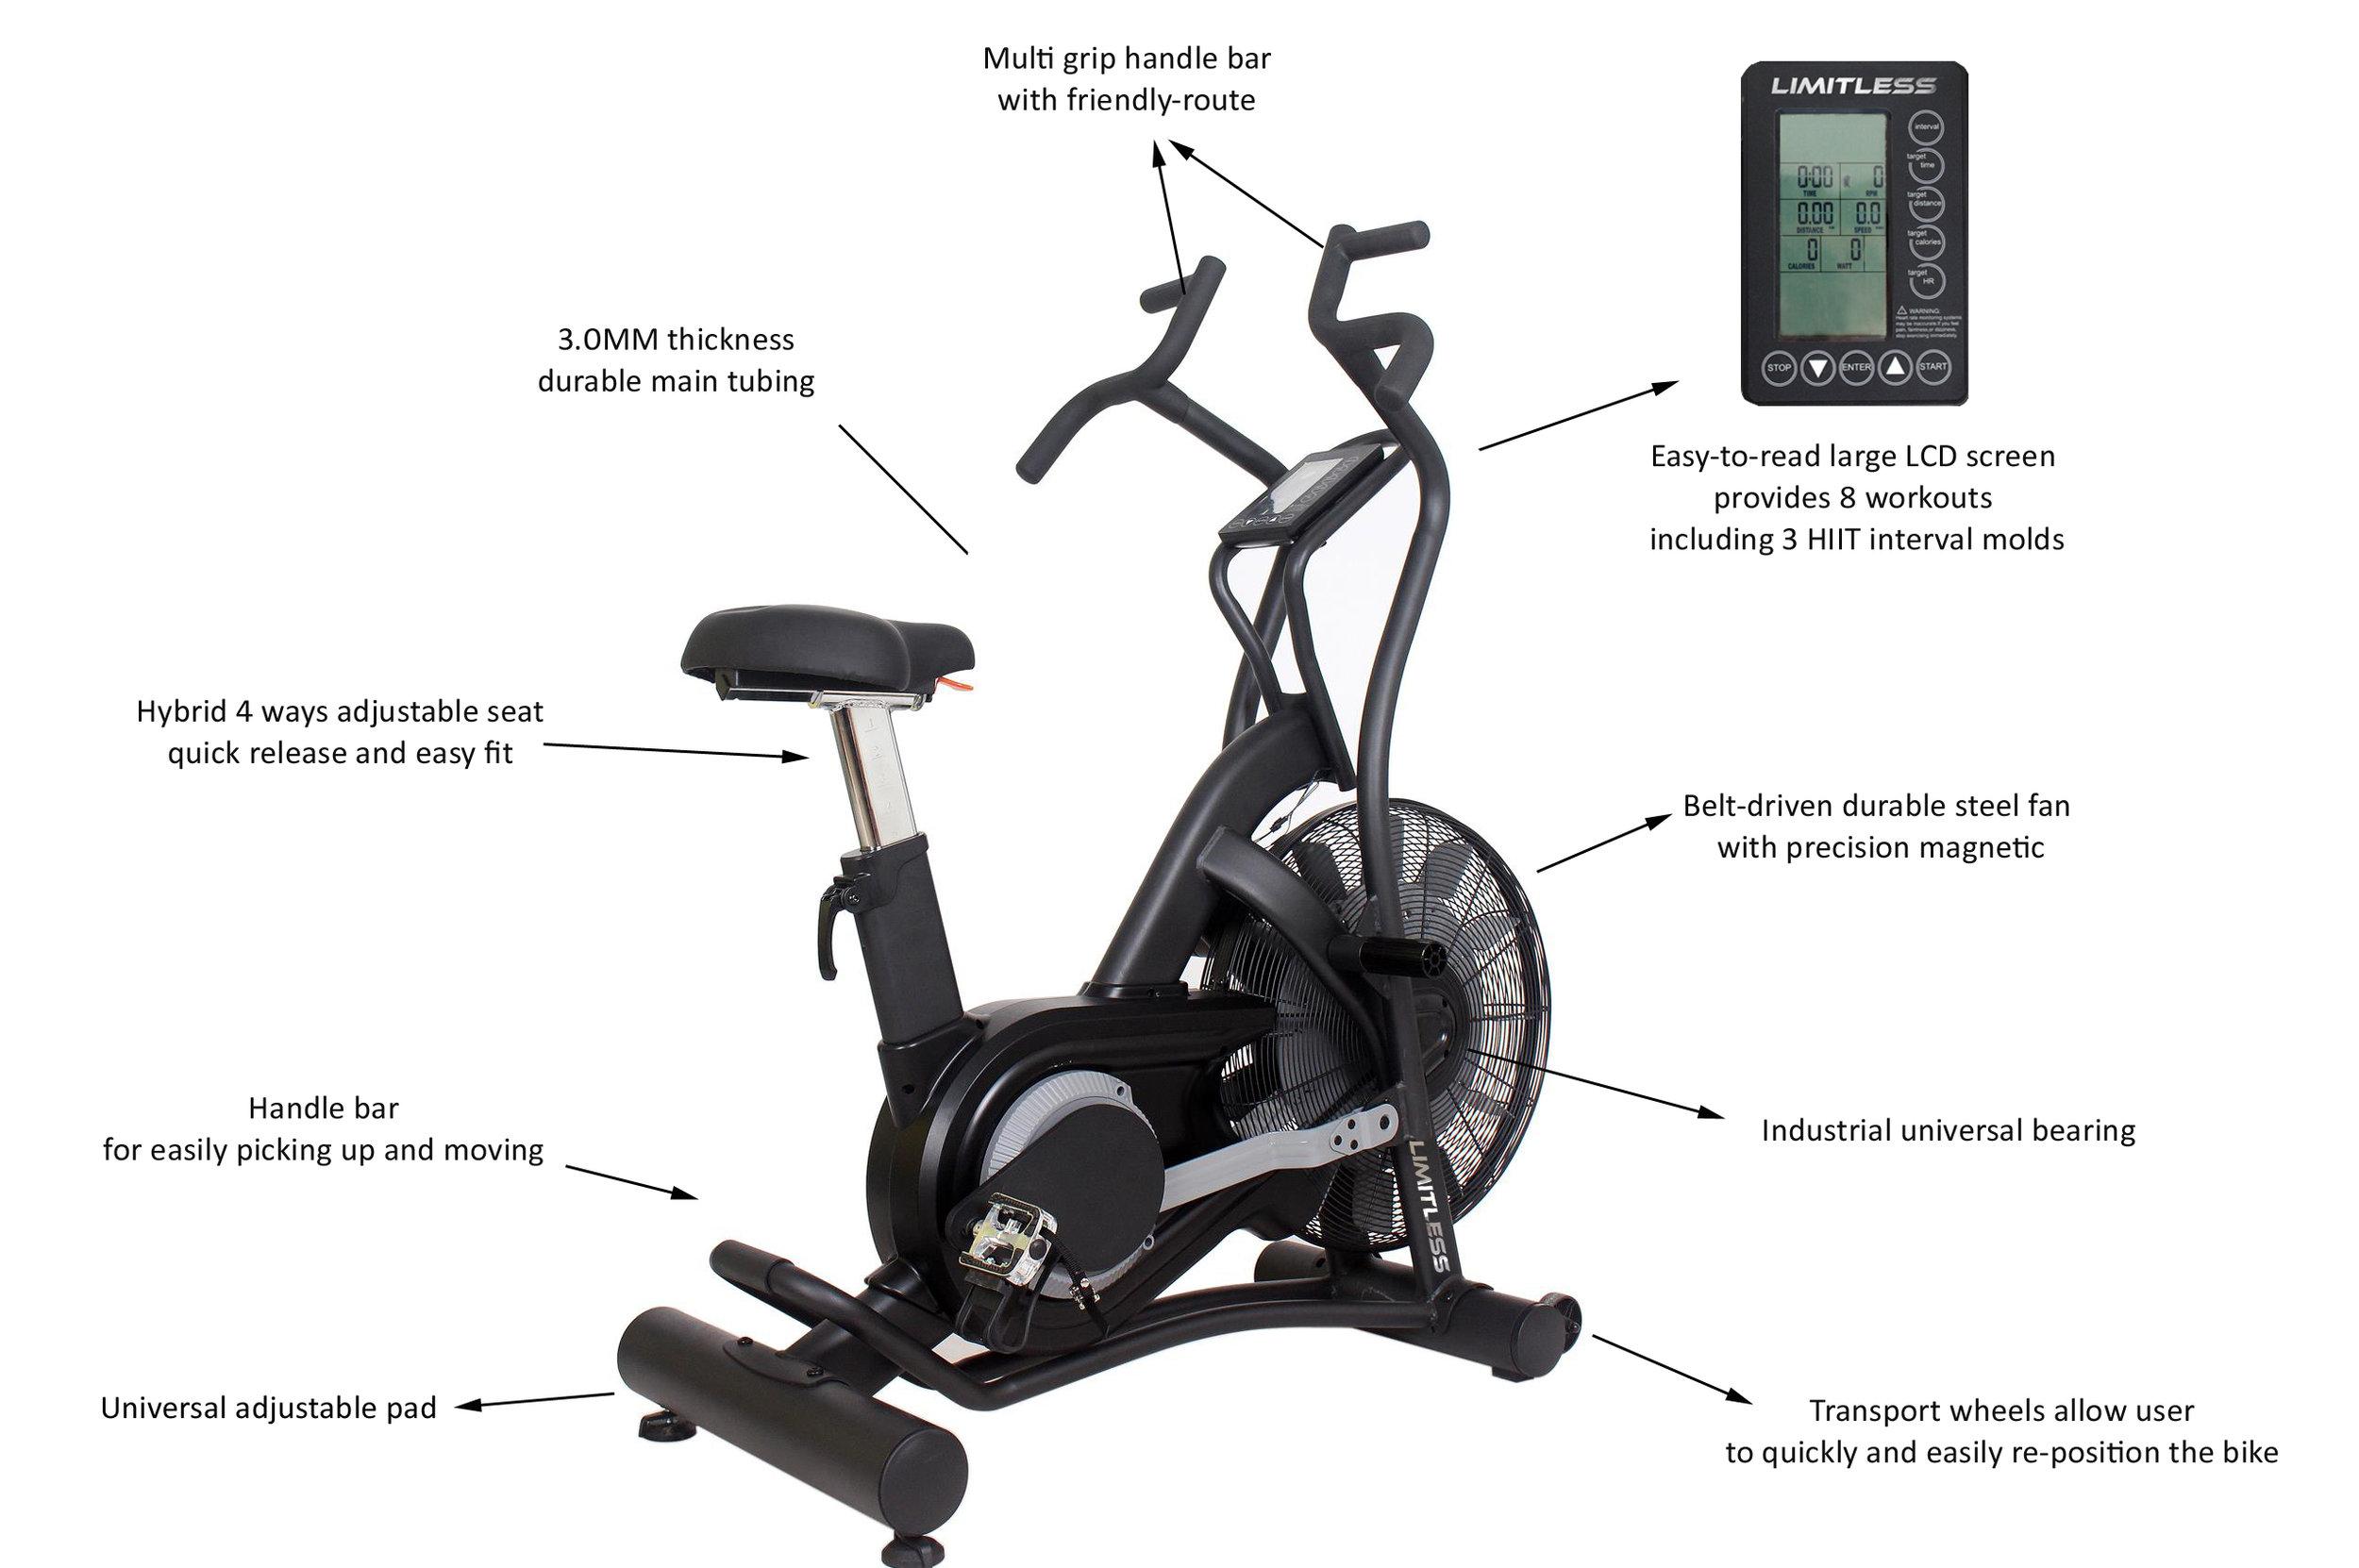 air bike LIMITLESS POSTER copy.jpg